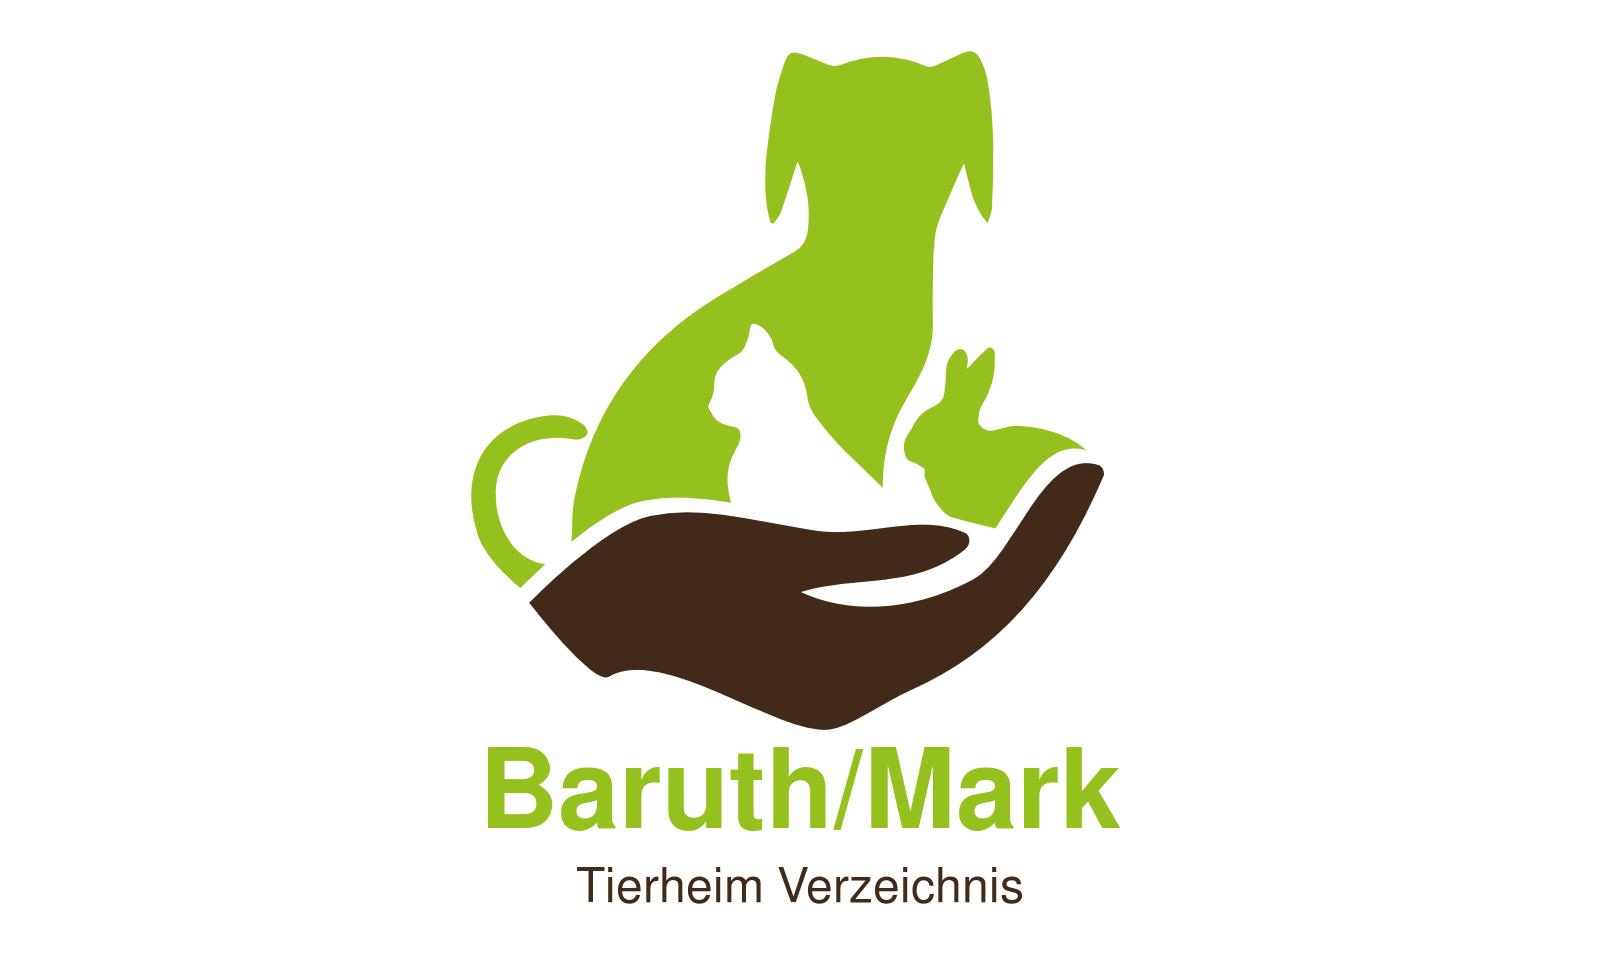 Tierheim Baruth/Mark